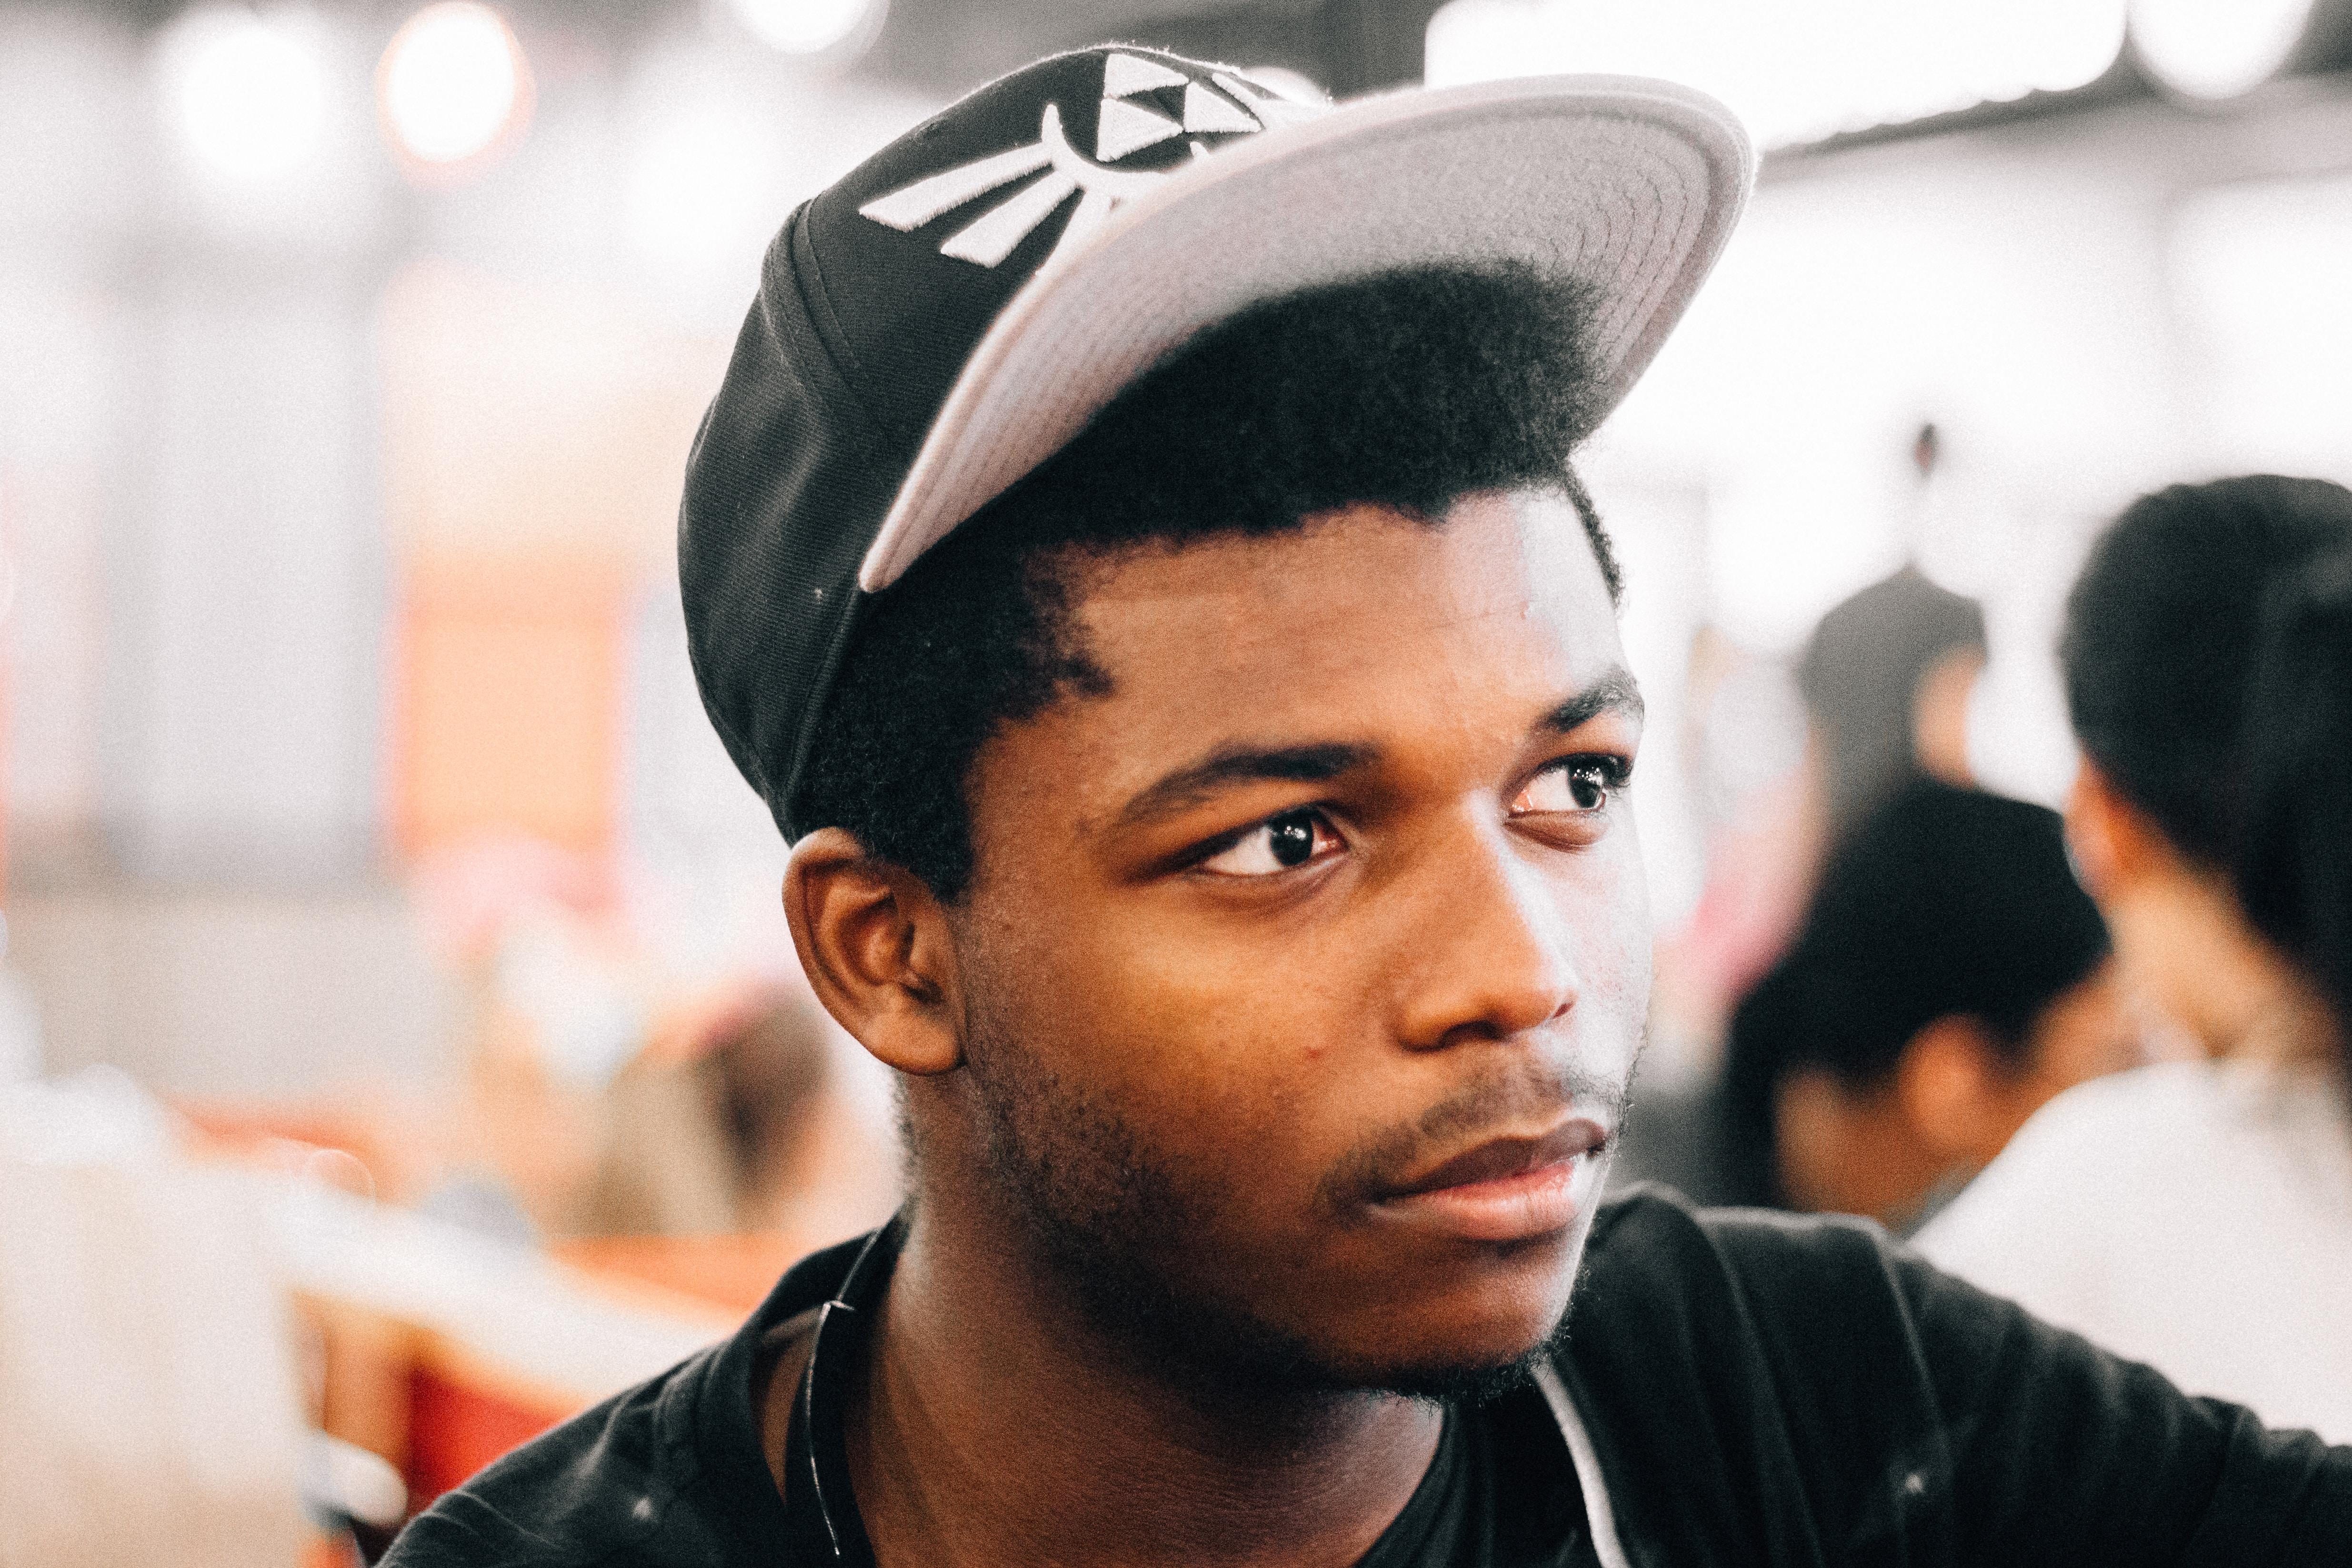 closeup photo of man wearing black and white cap